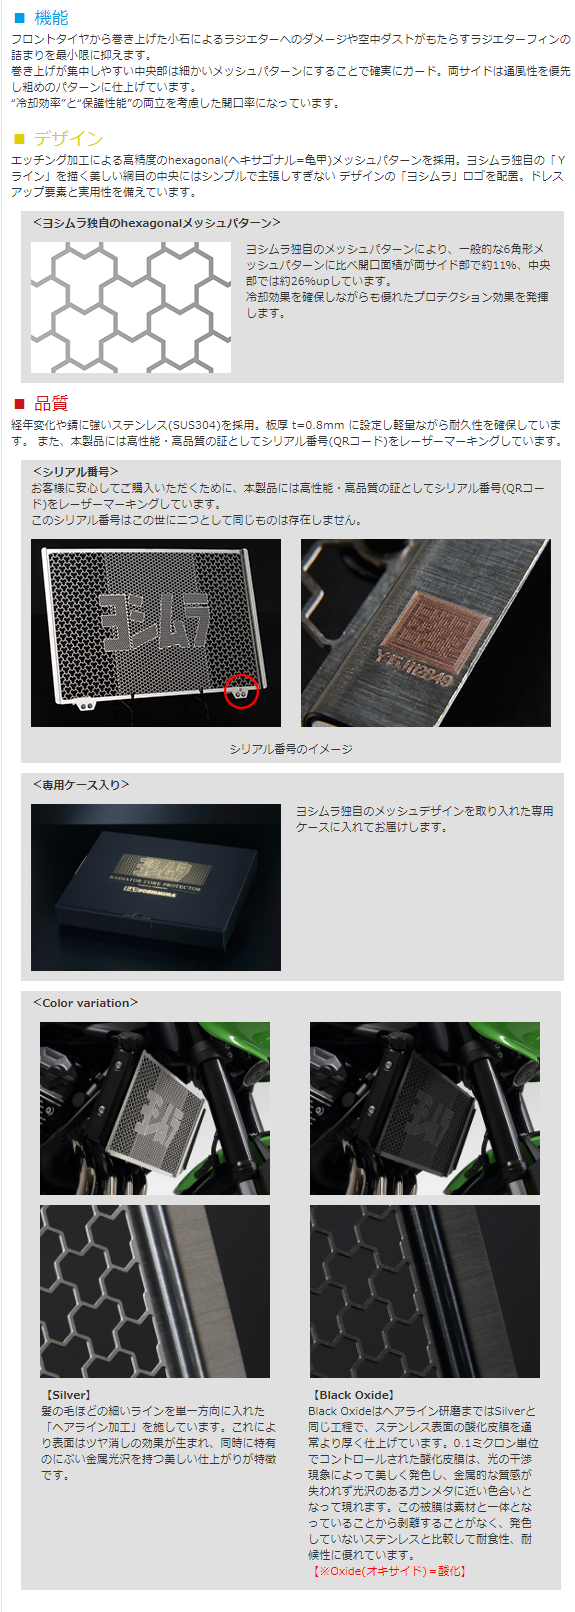 【YOSHIMURA】水箱護罩 - 「Webike-摩托百貨」